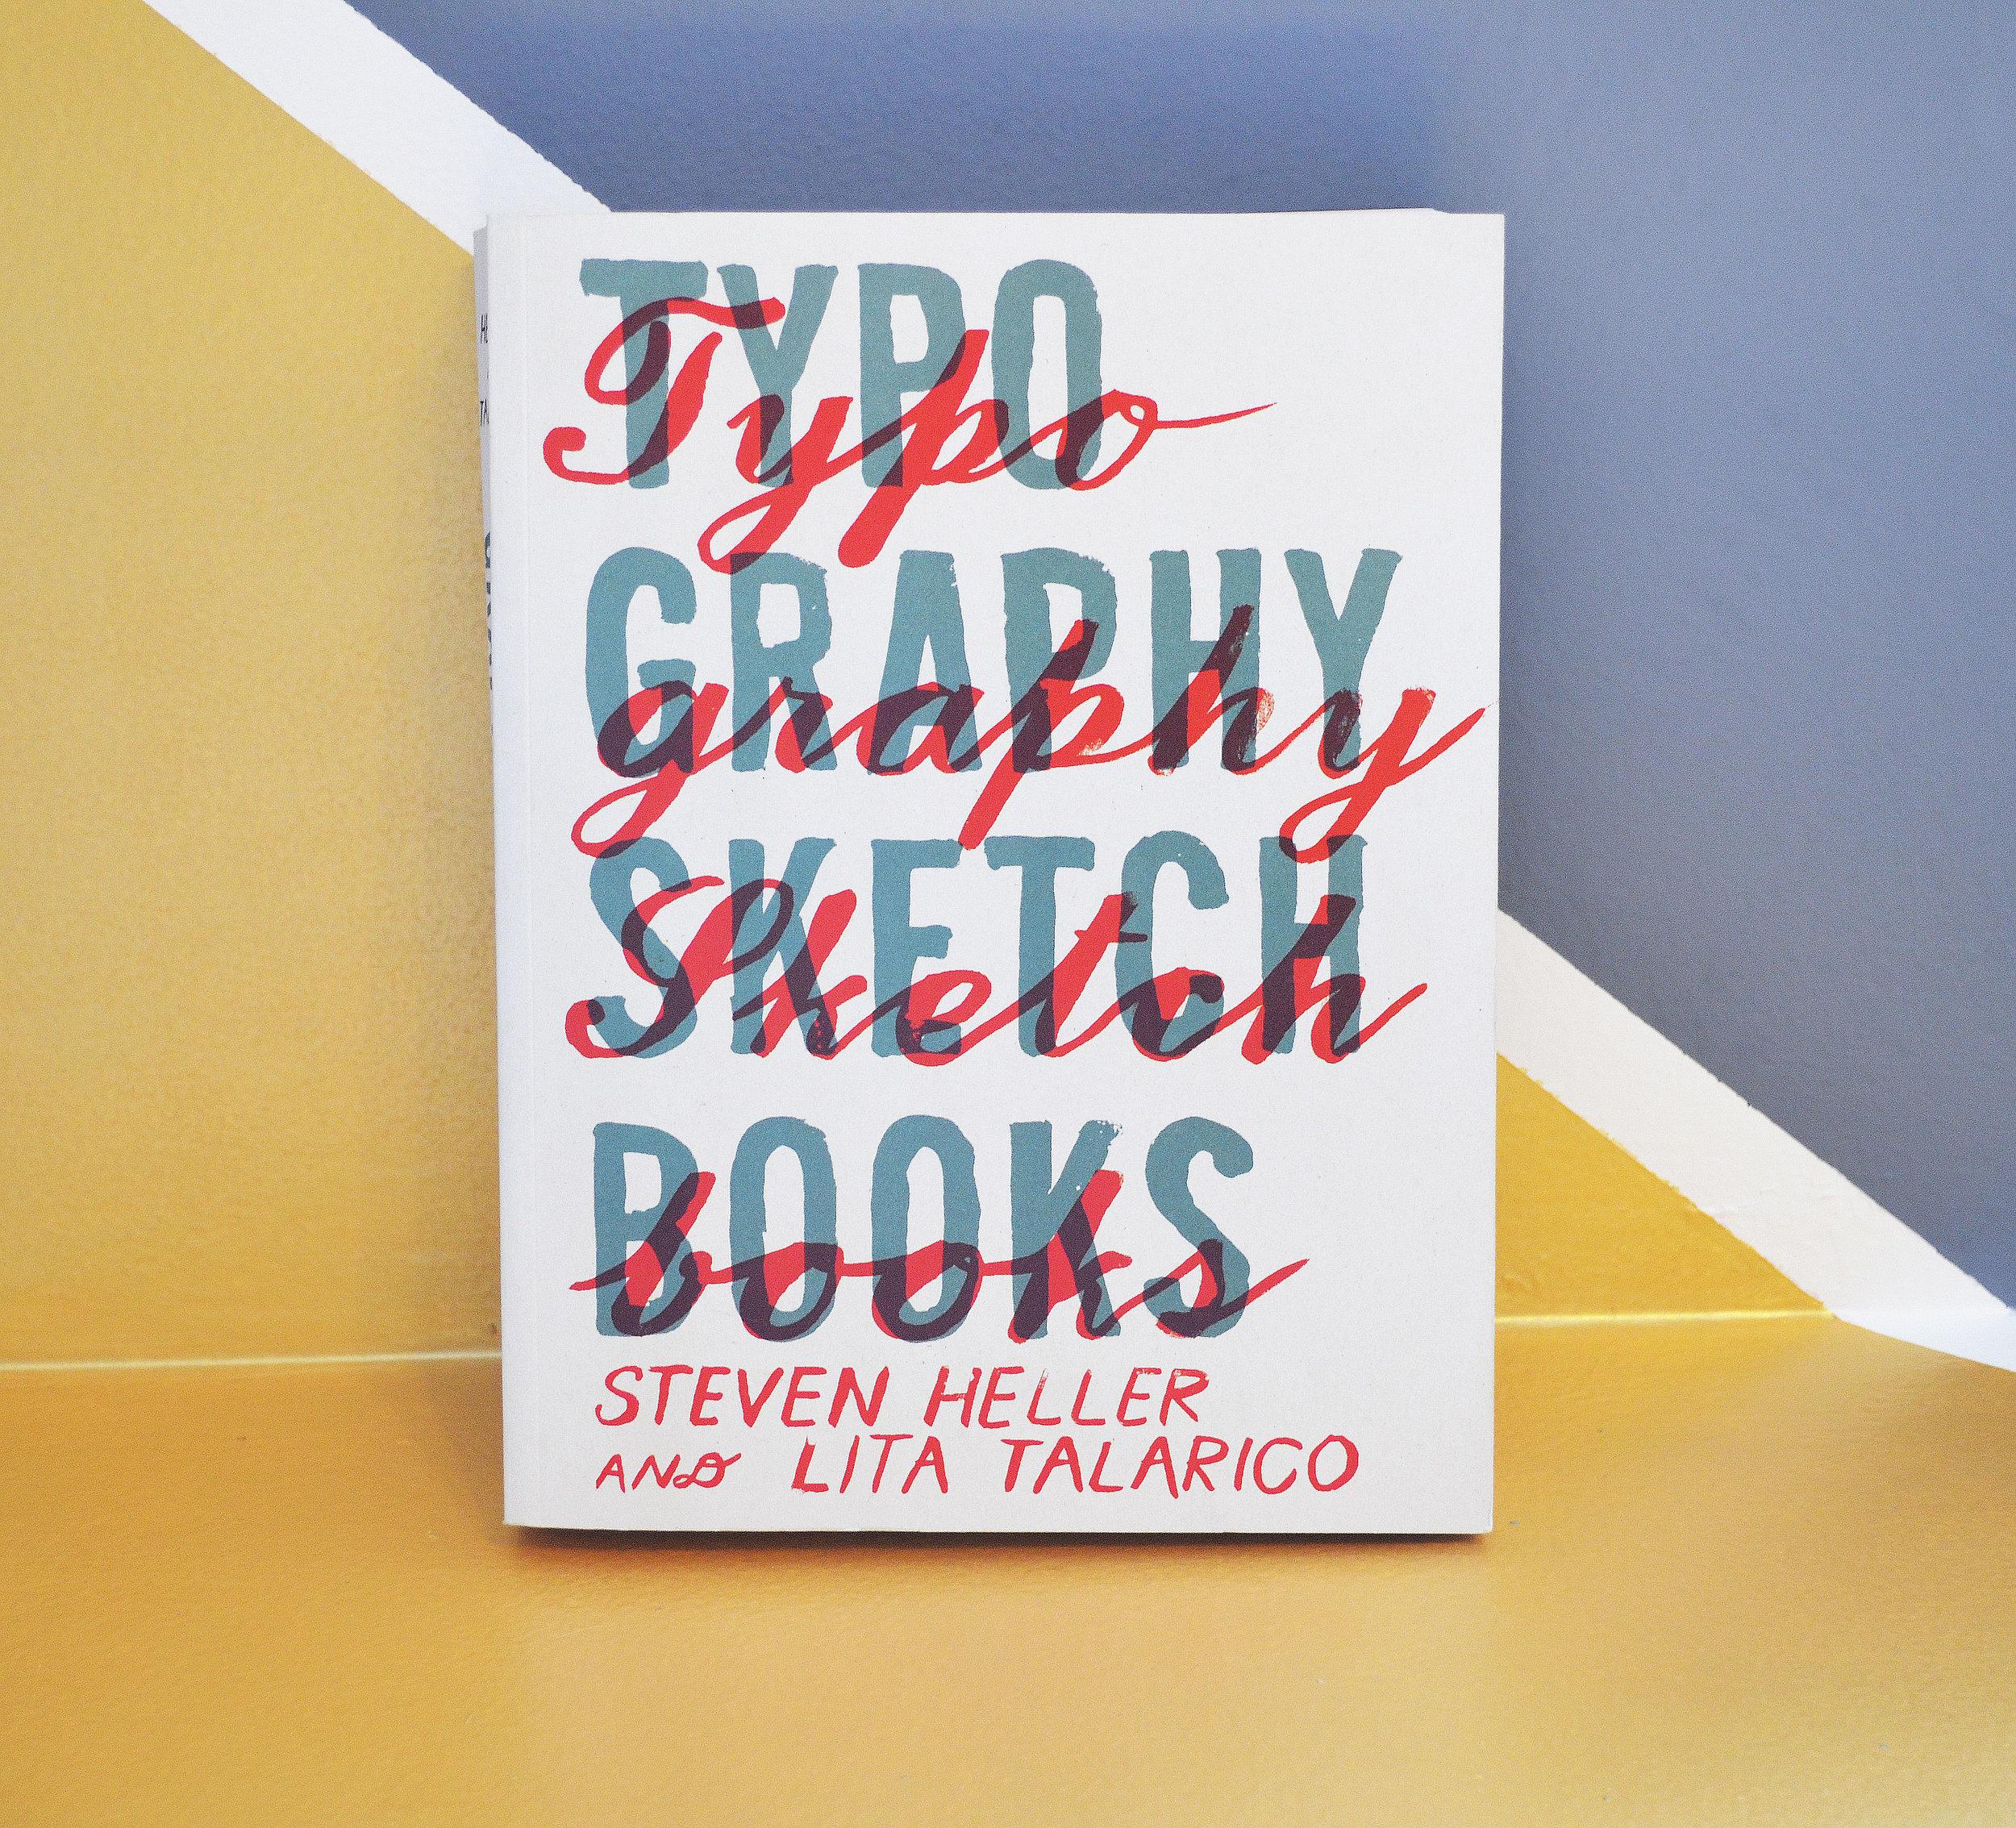 TypographySketchbooksweb.jpg